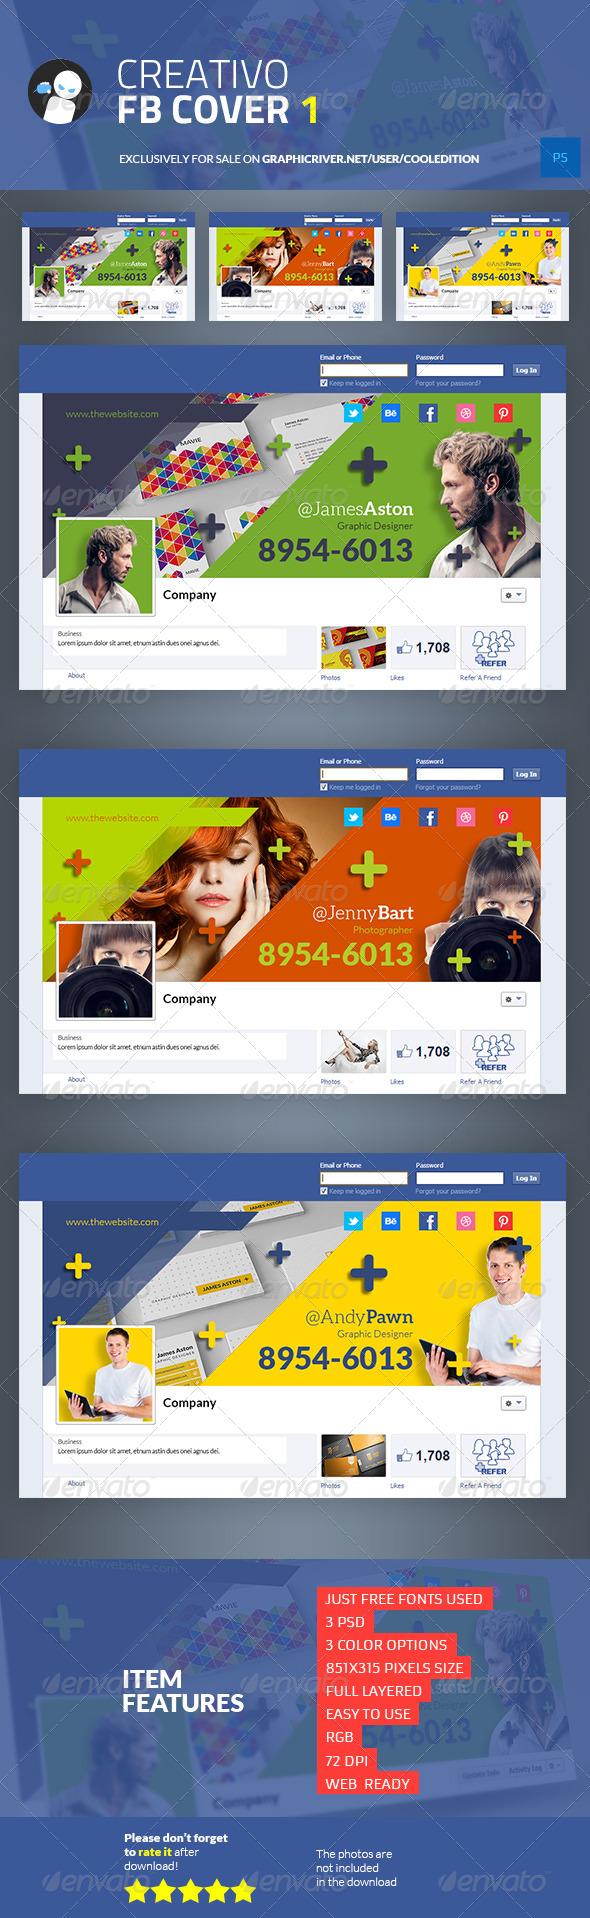 GraphicRiver Creativo Facebook Cover 1 6790014